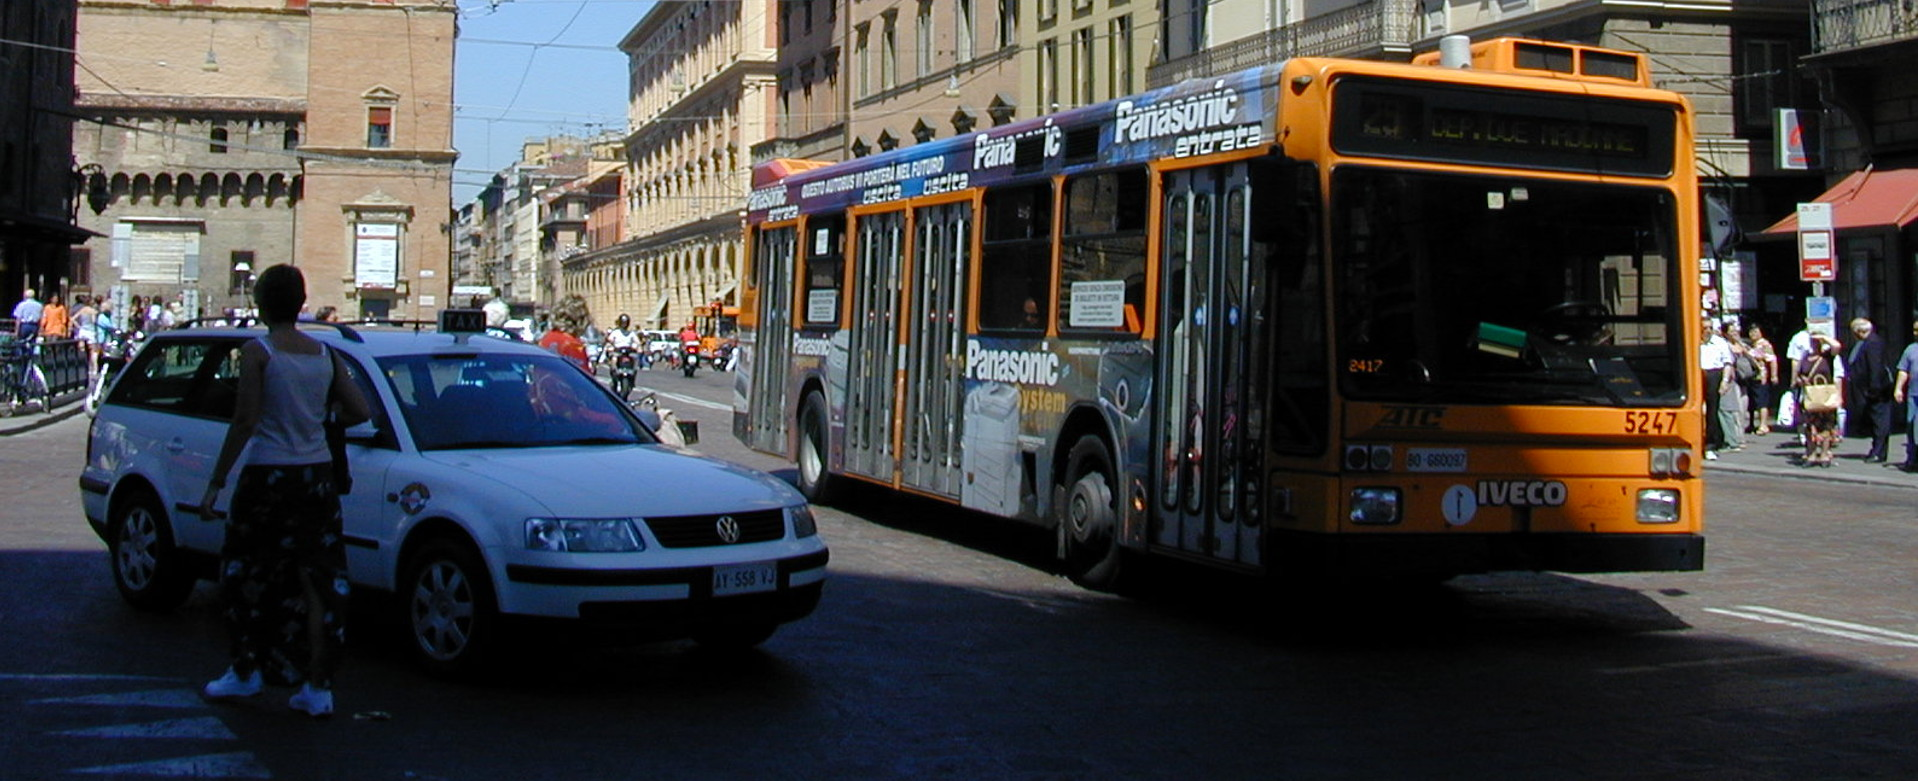 Foto: Taxi a Bologna - Archivio Città metropolitana di Bologna